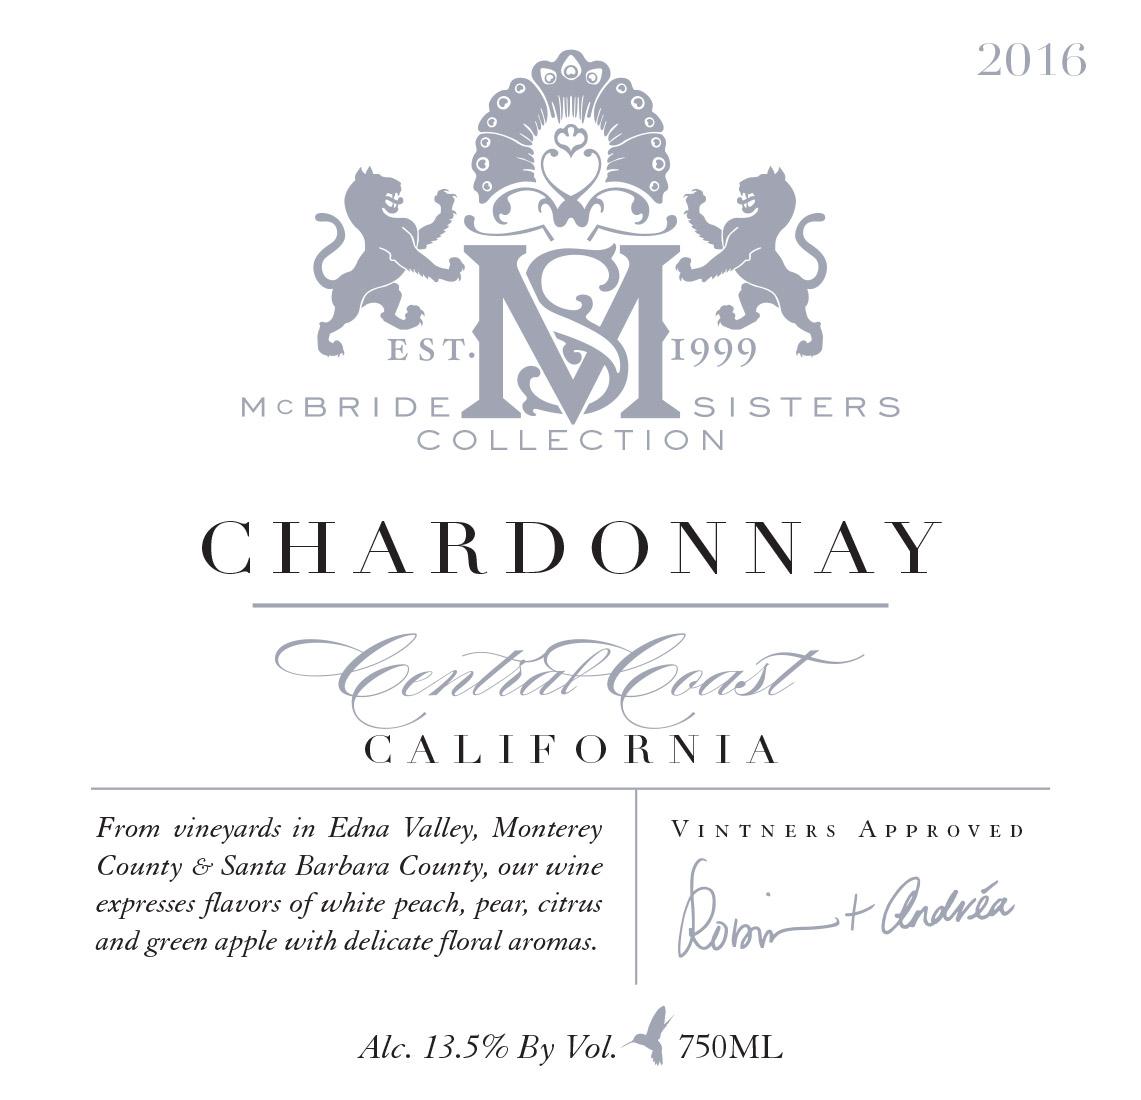 McBrideSisters-Chardonnay-Front-label-3.8in-X-3.6614in.jpg